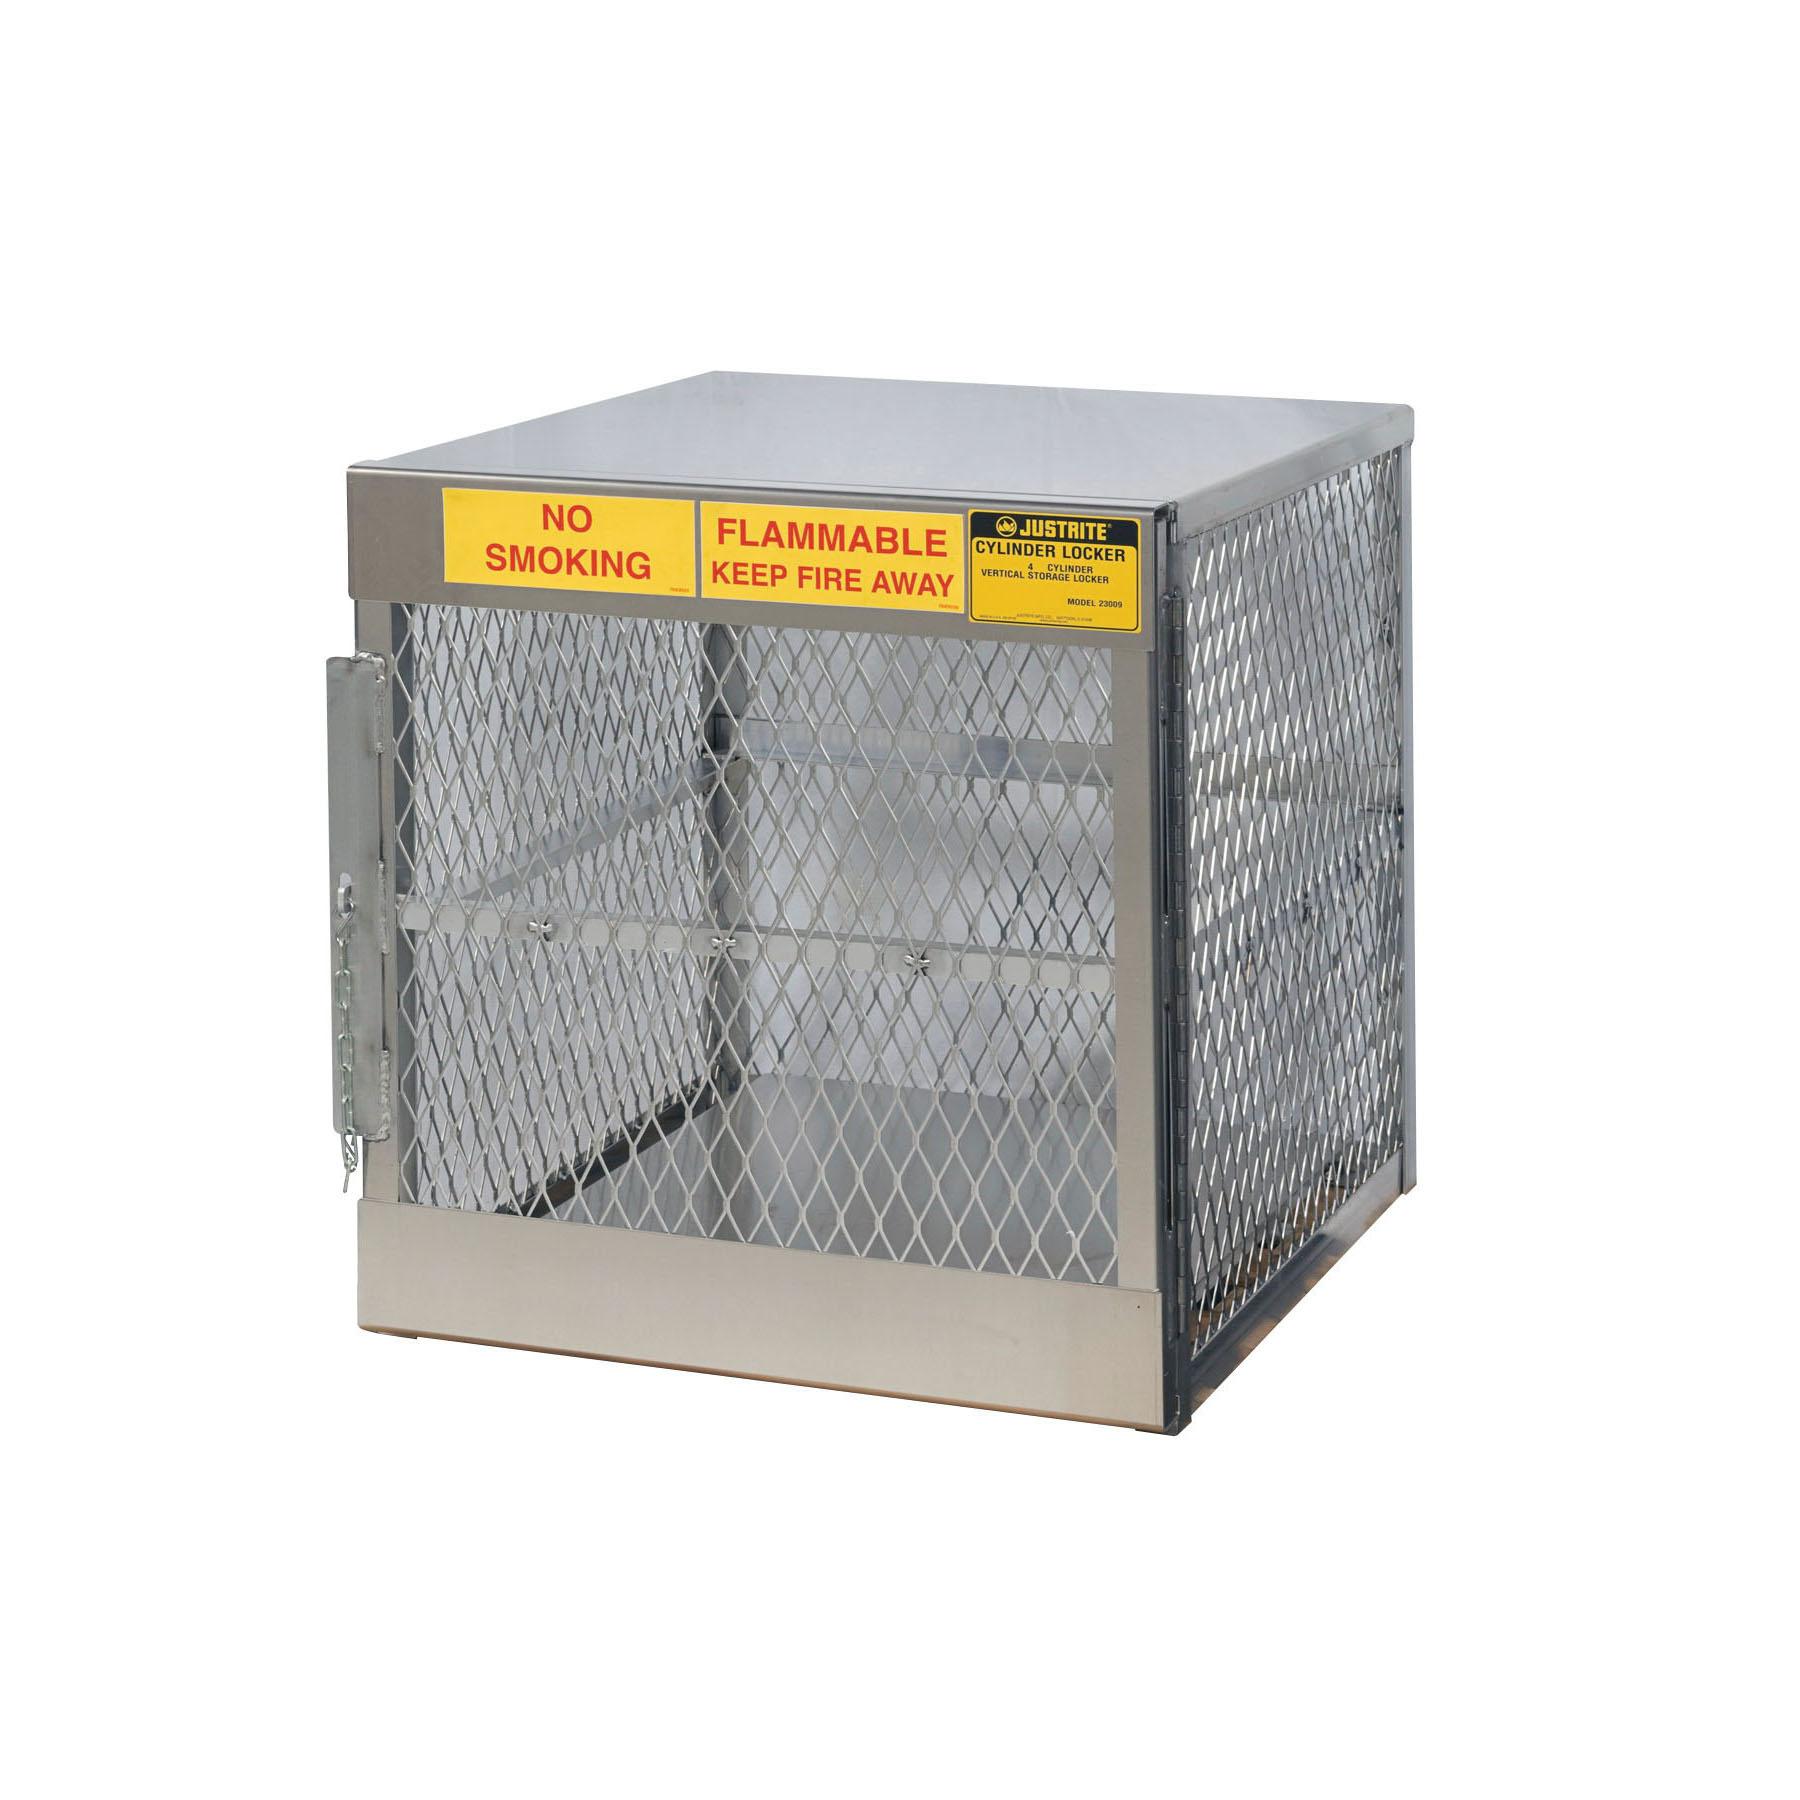 Justrite® 23009 Vertical LPG Cylinder Locker, (4) 20 lb/33 lb, 33-1/2 H x 30 in W x 32 in D, Aluminum Roof, Welded Aluminum, Aluminum